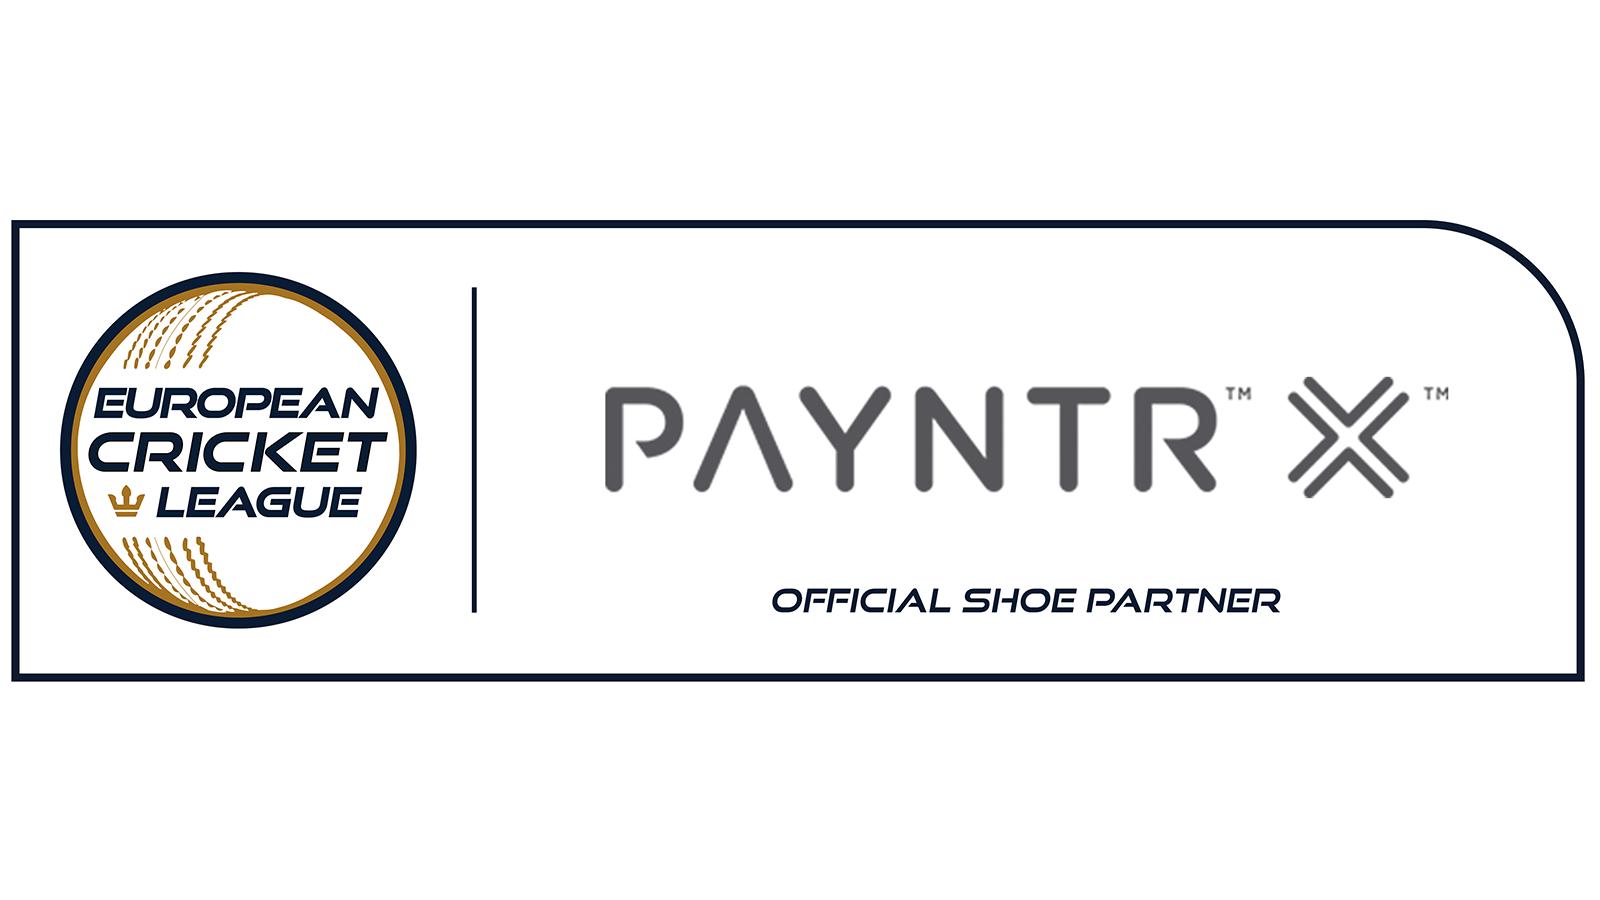 Payntr 1600x900.png